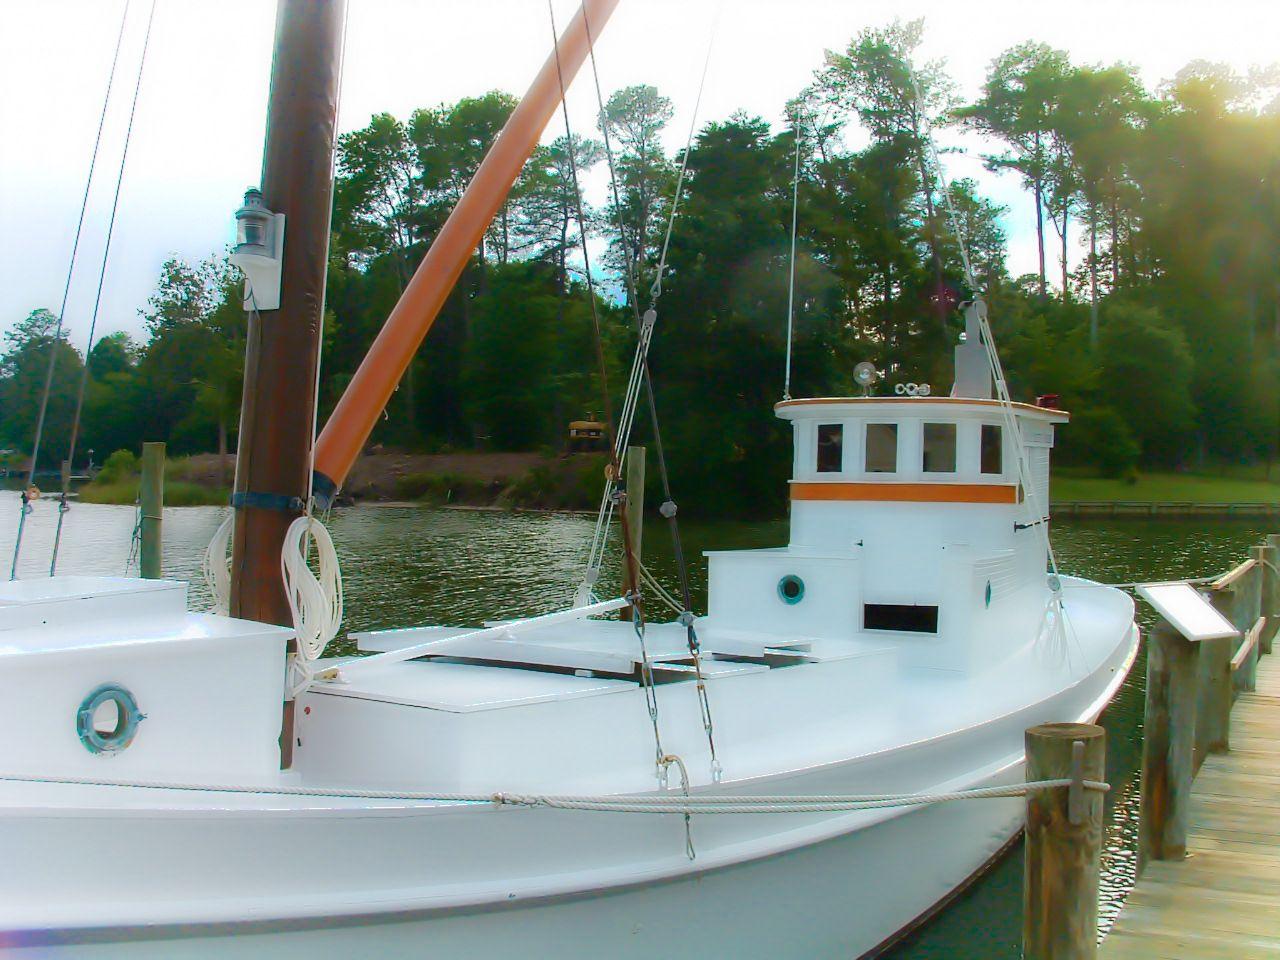 Elva c is a chesapeake bay deck boat built in 1922 by